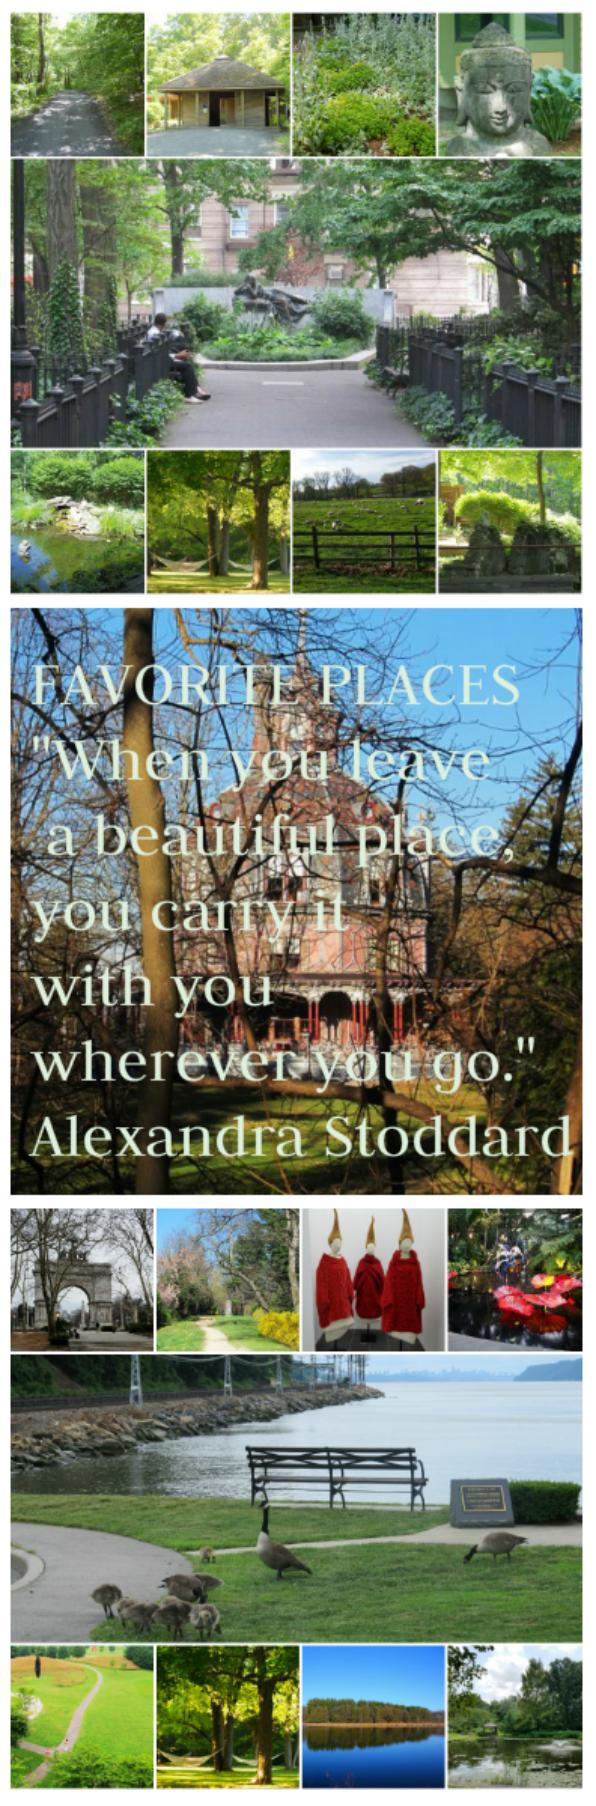 Photo Challenge: Favorite Places